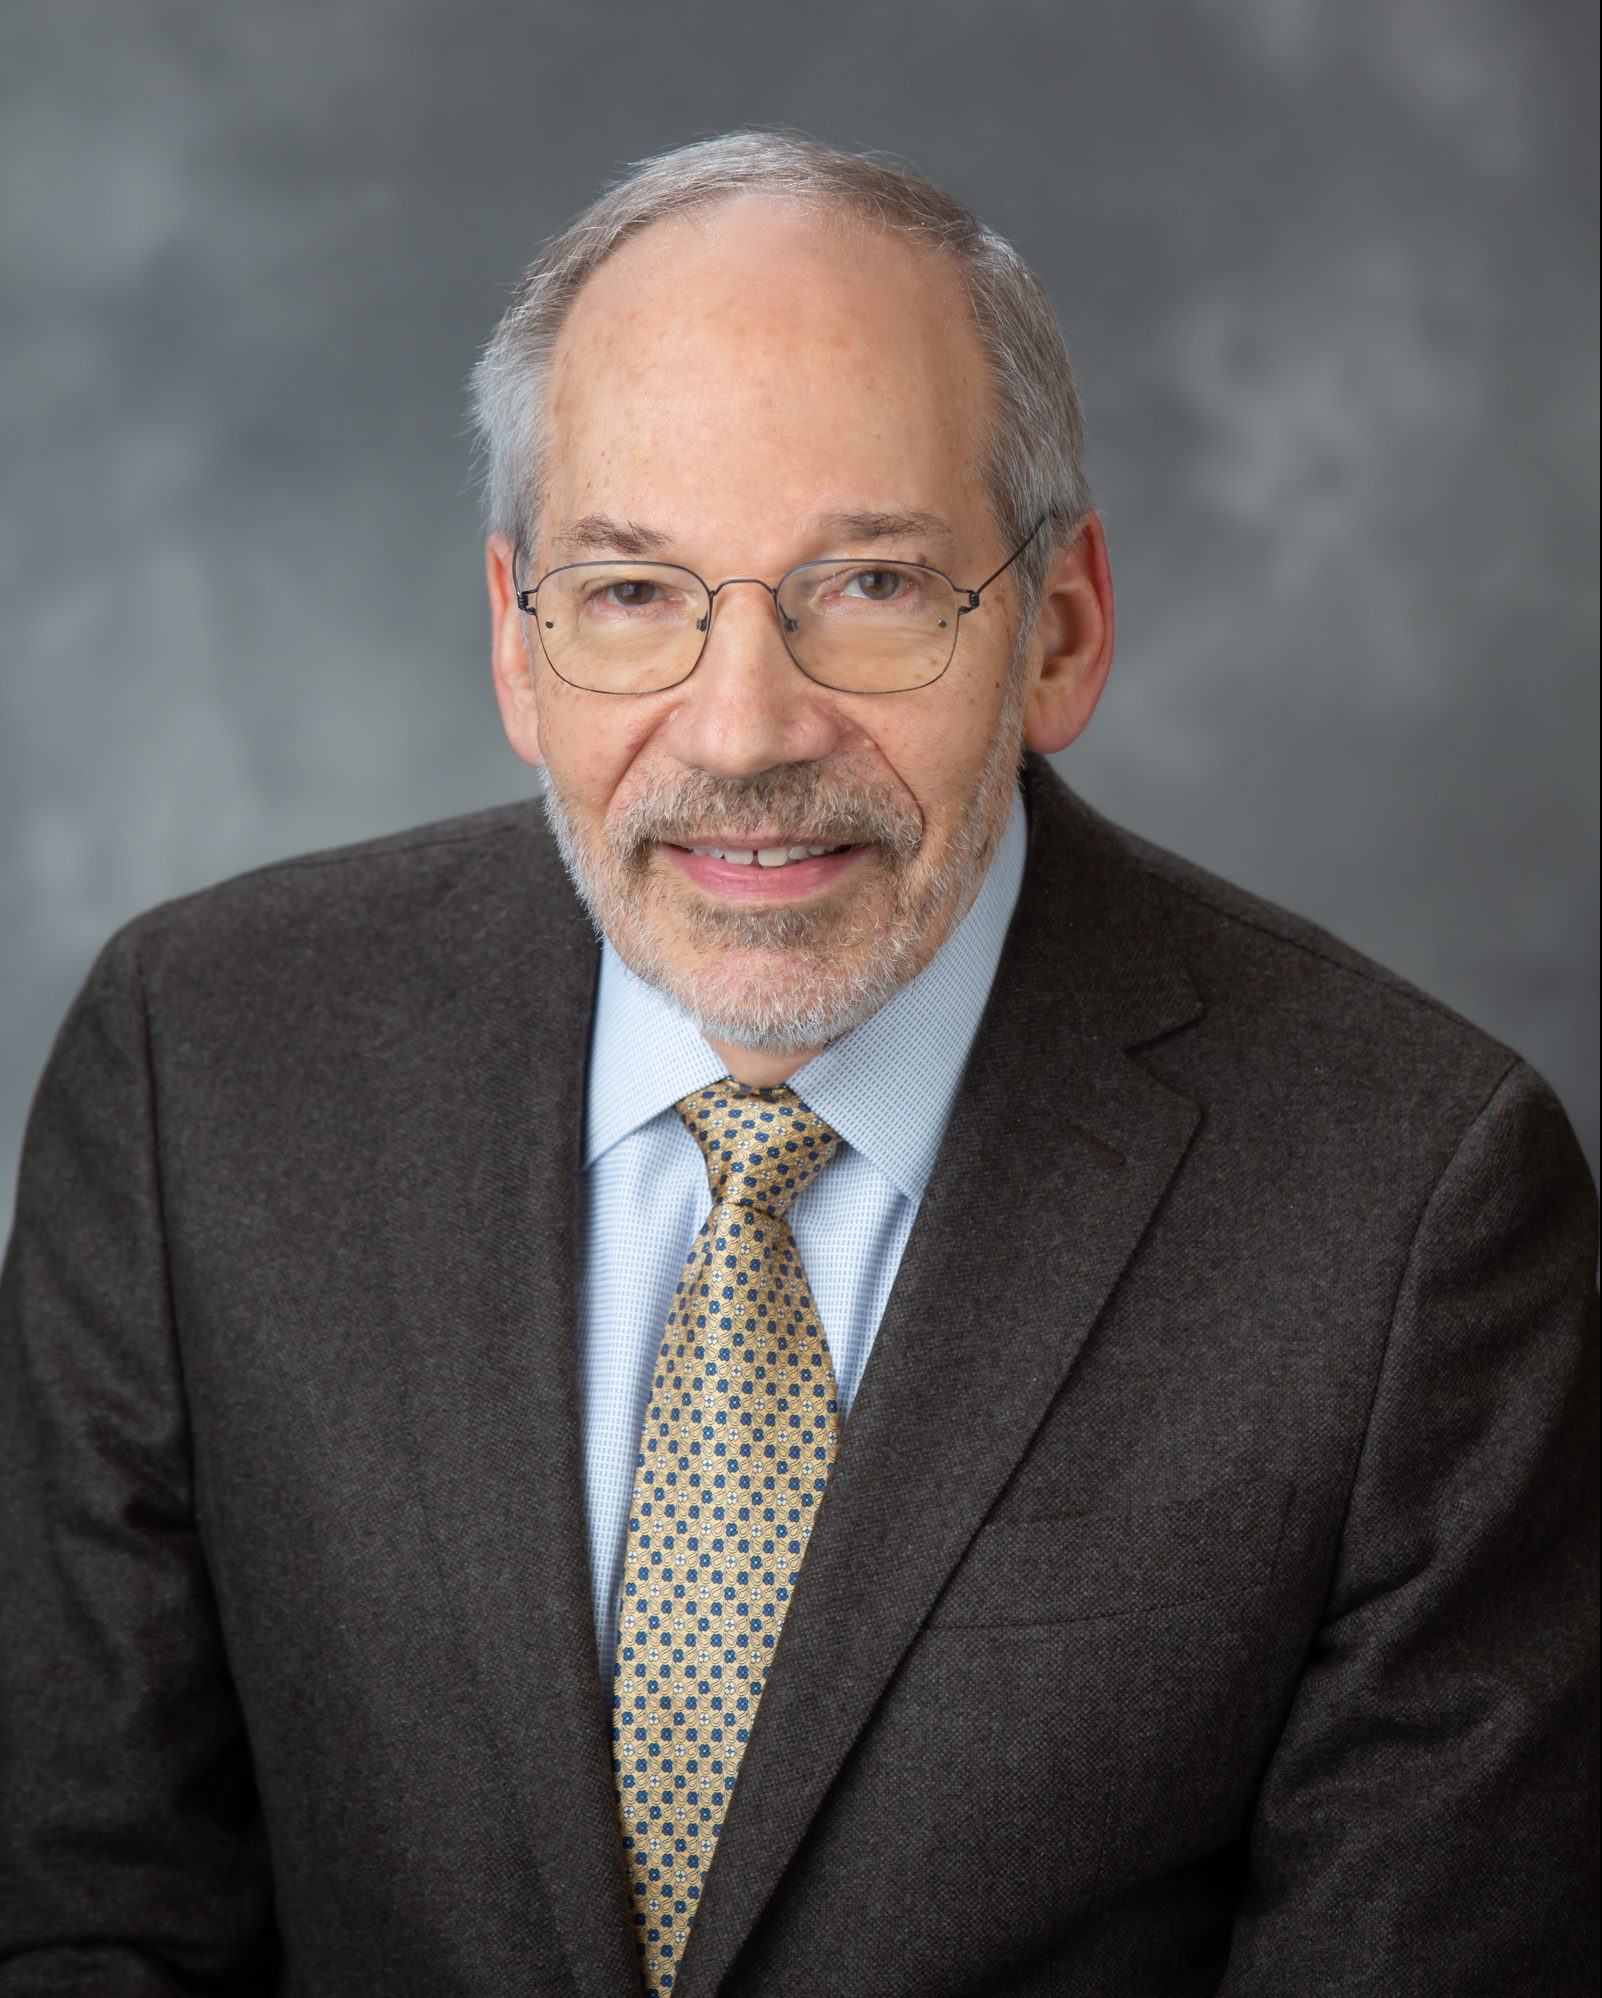 Paul B. Ginsburg